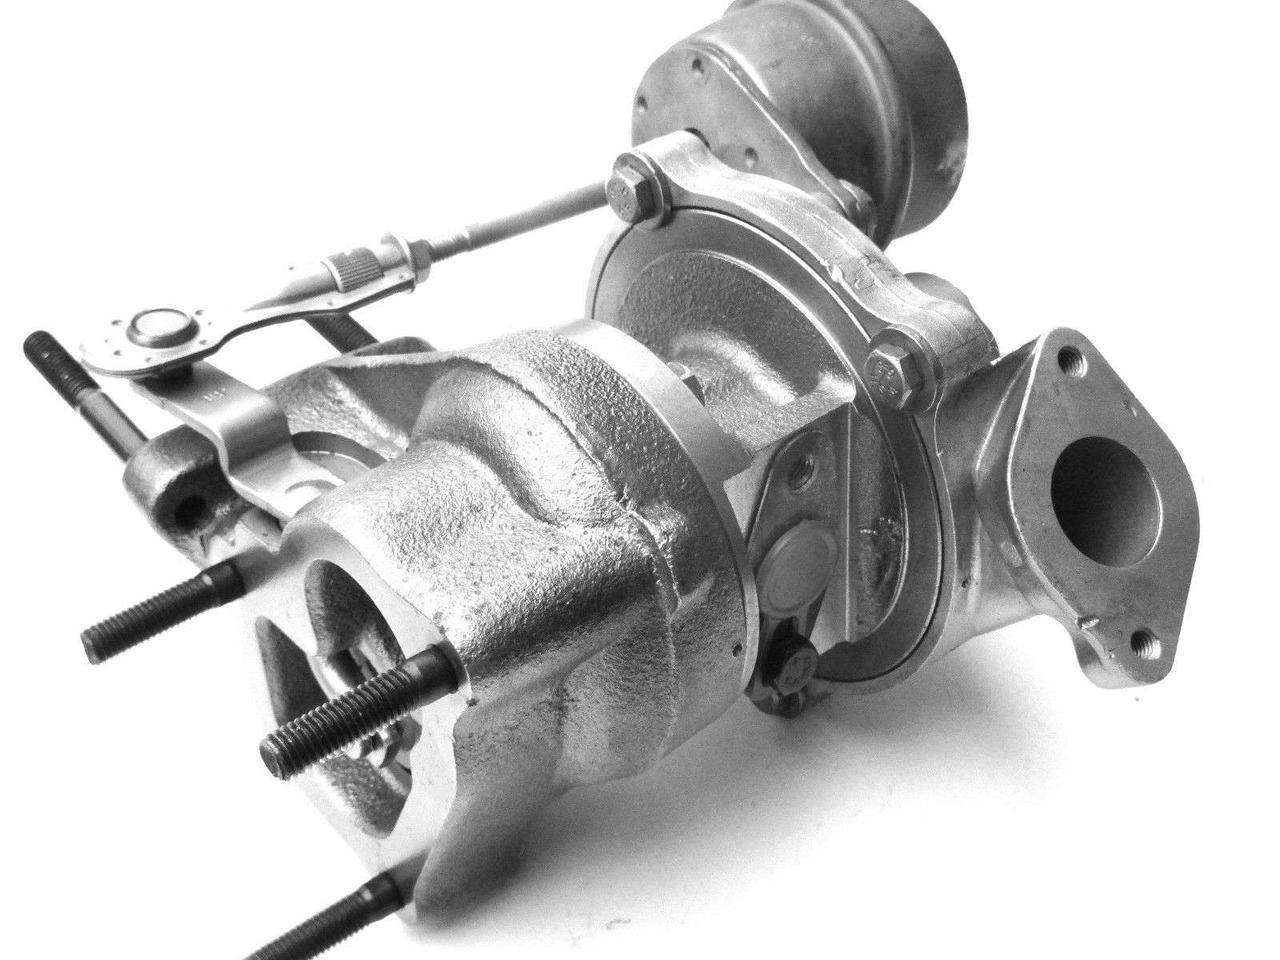 Турбина 54359880018 (Fiat 500 1.3 D Multijet 75 HP), фото 1